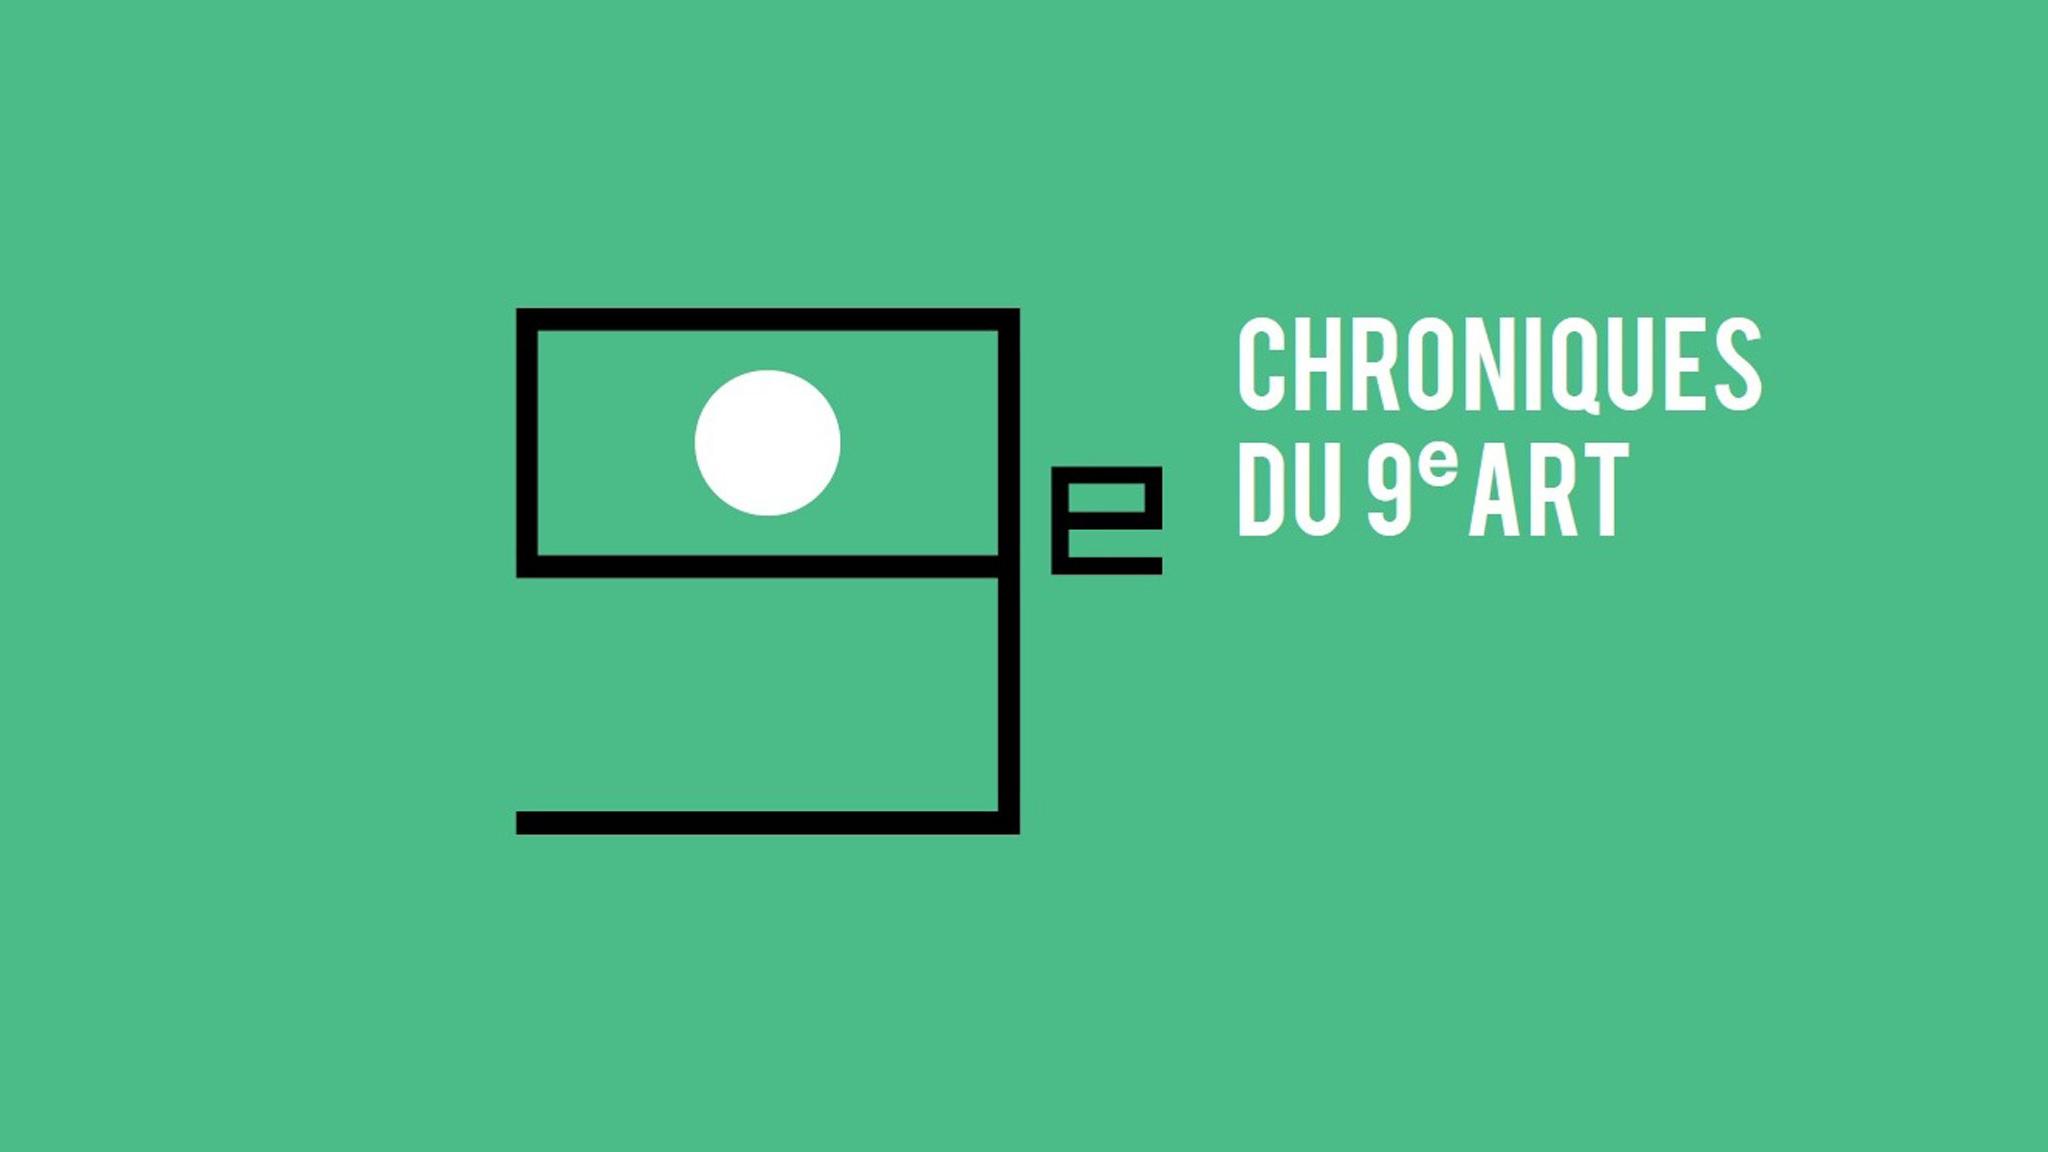 Chroniques du 9e art